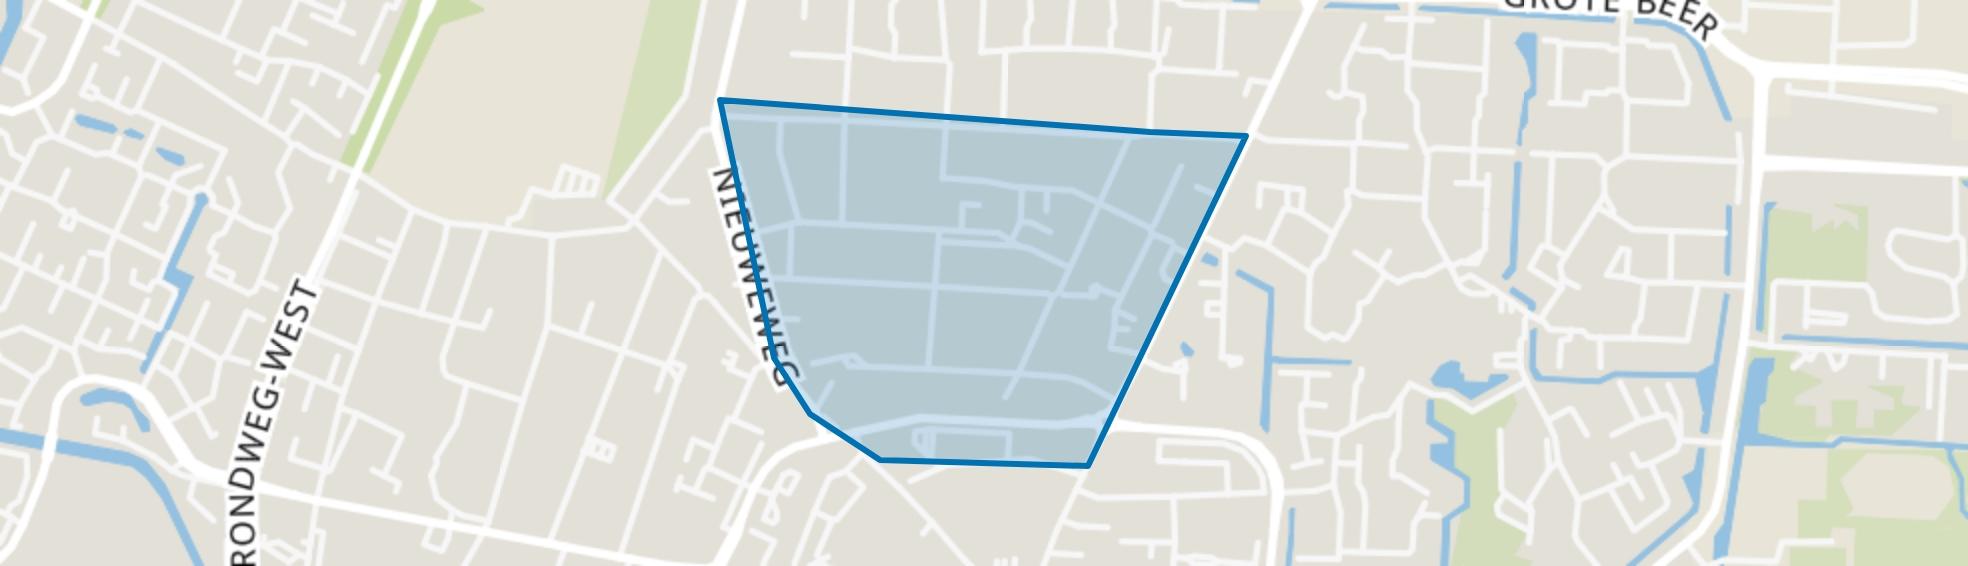 De Pol, Veenendaal map